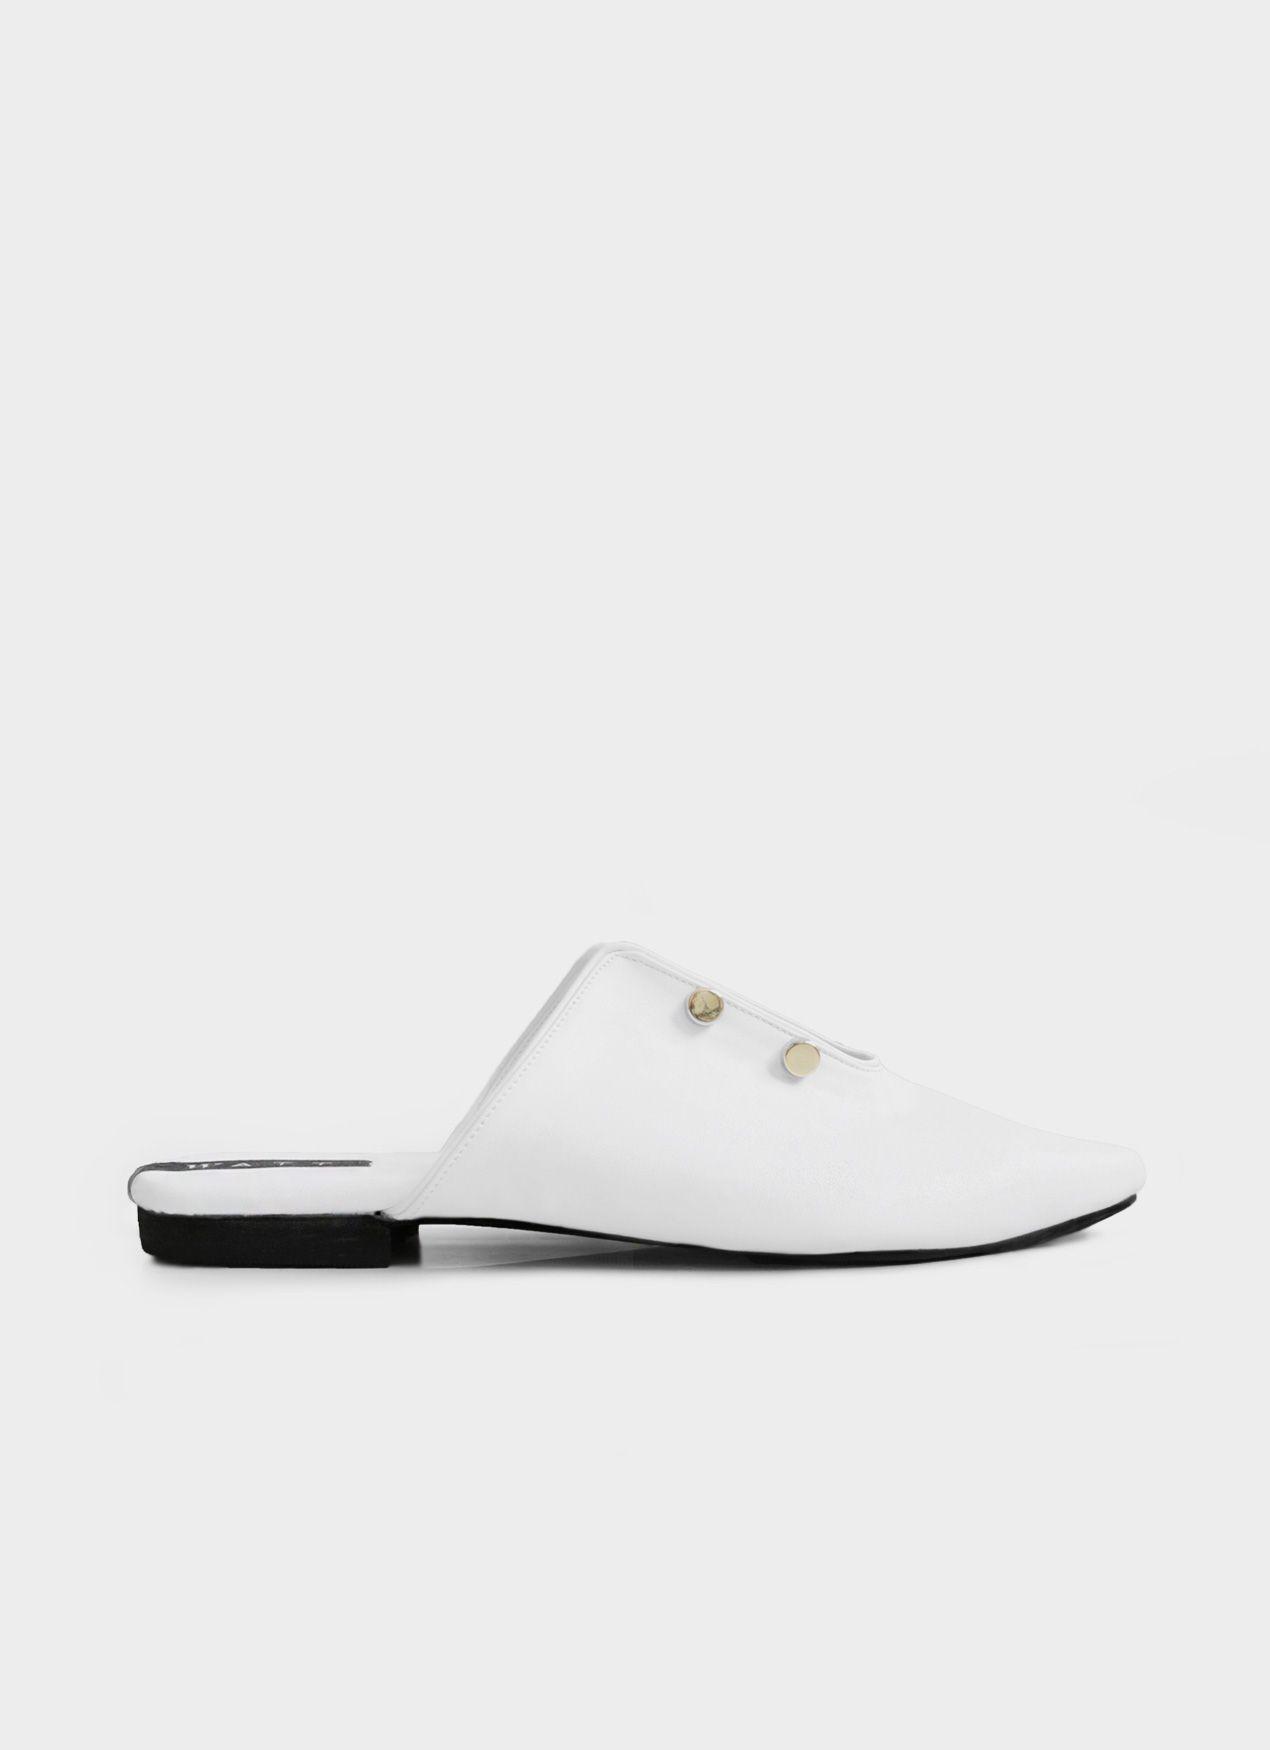 #PopbelaOOTD: Kumpulan Sepatu Kulit dari Brand Lokal